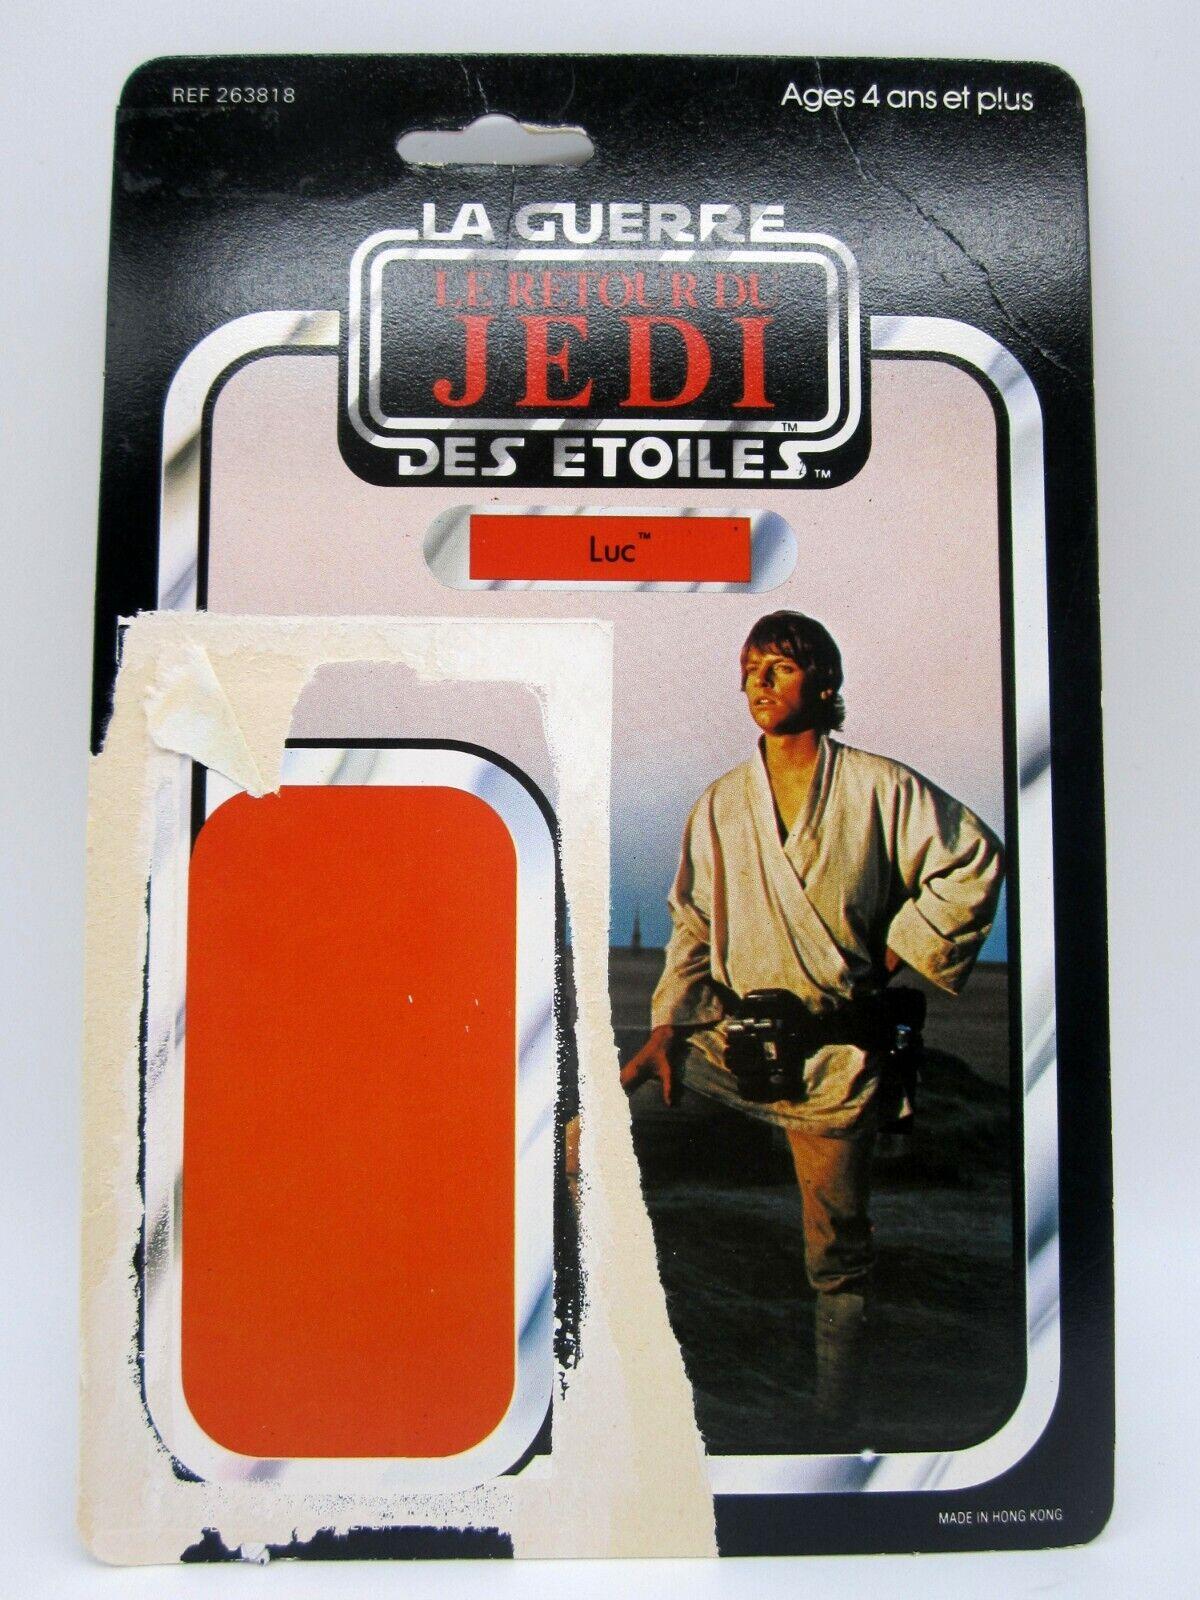 Vintage 1983 Meccanico Guerre stellari rossoJ Luke cielowalker Francia - 45 autota Back